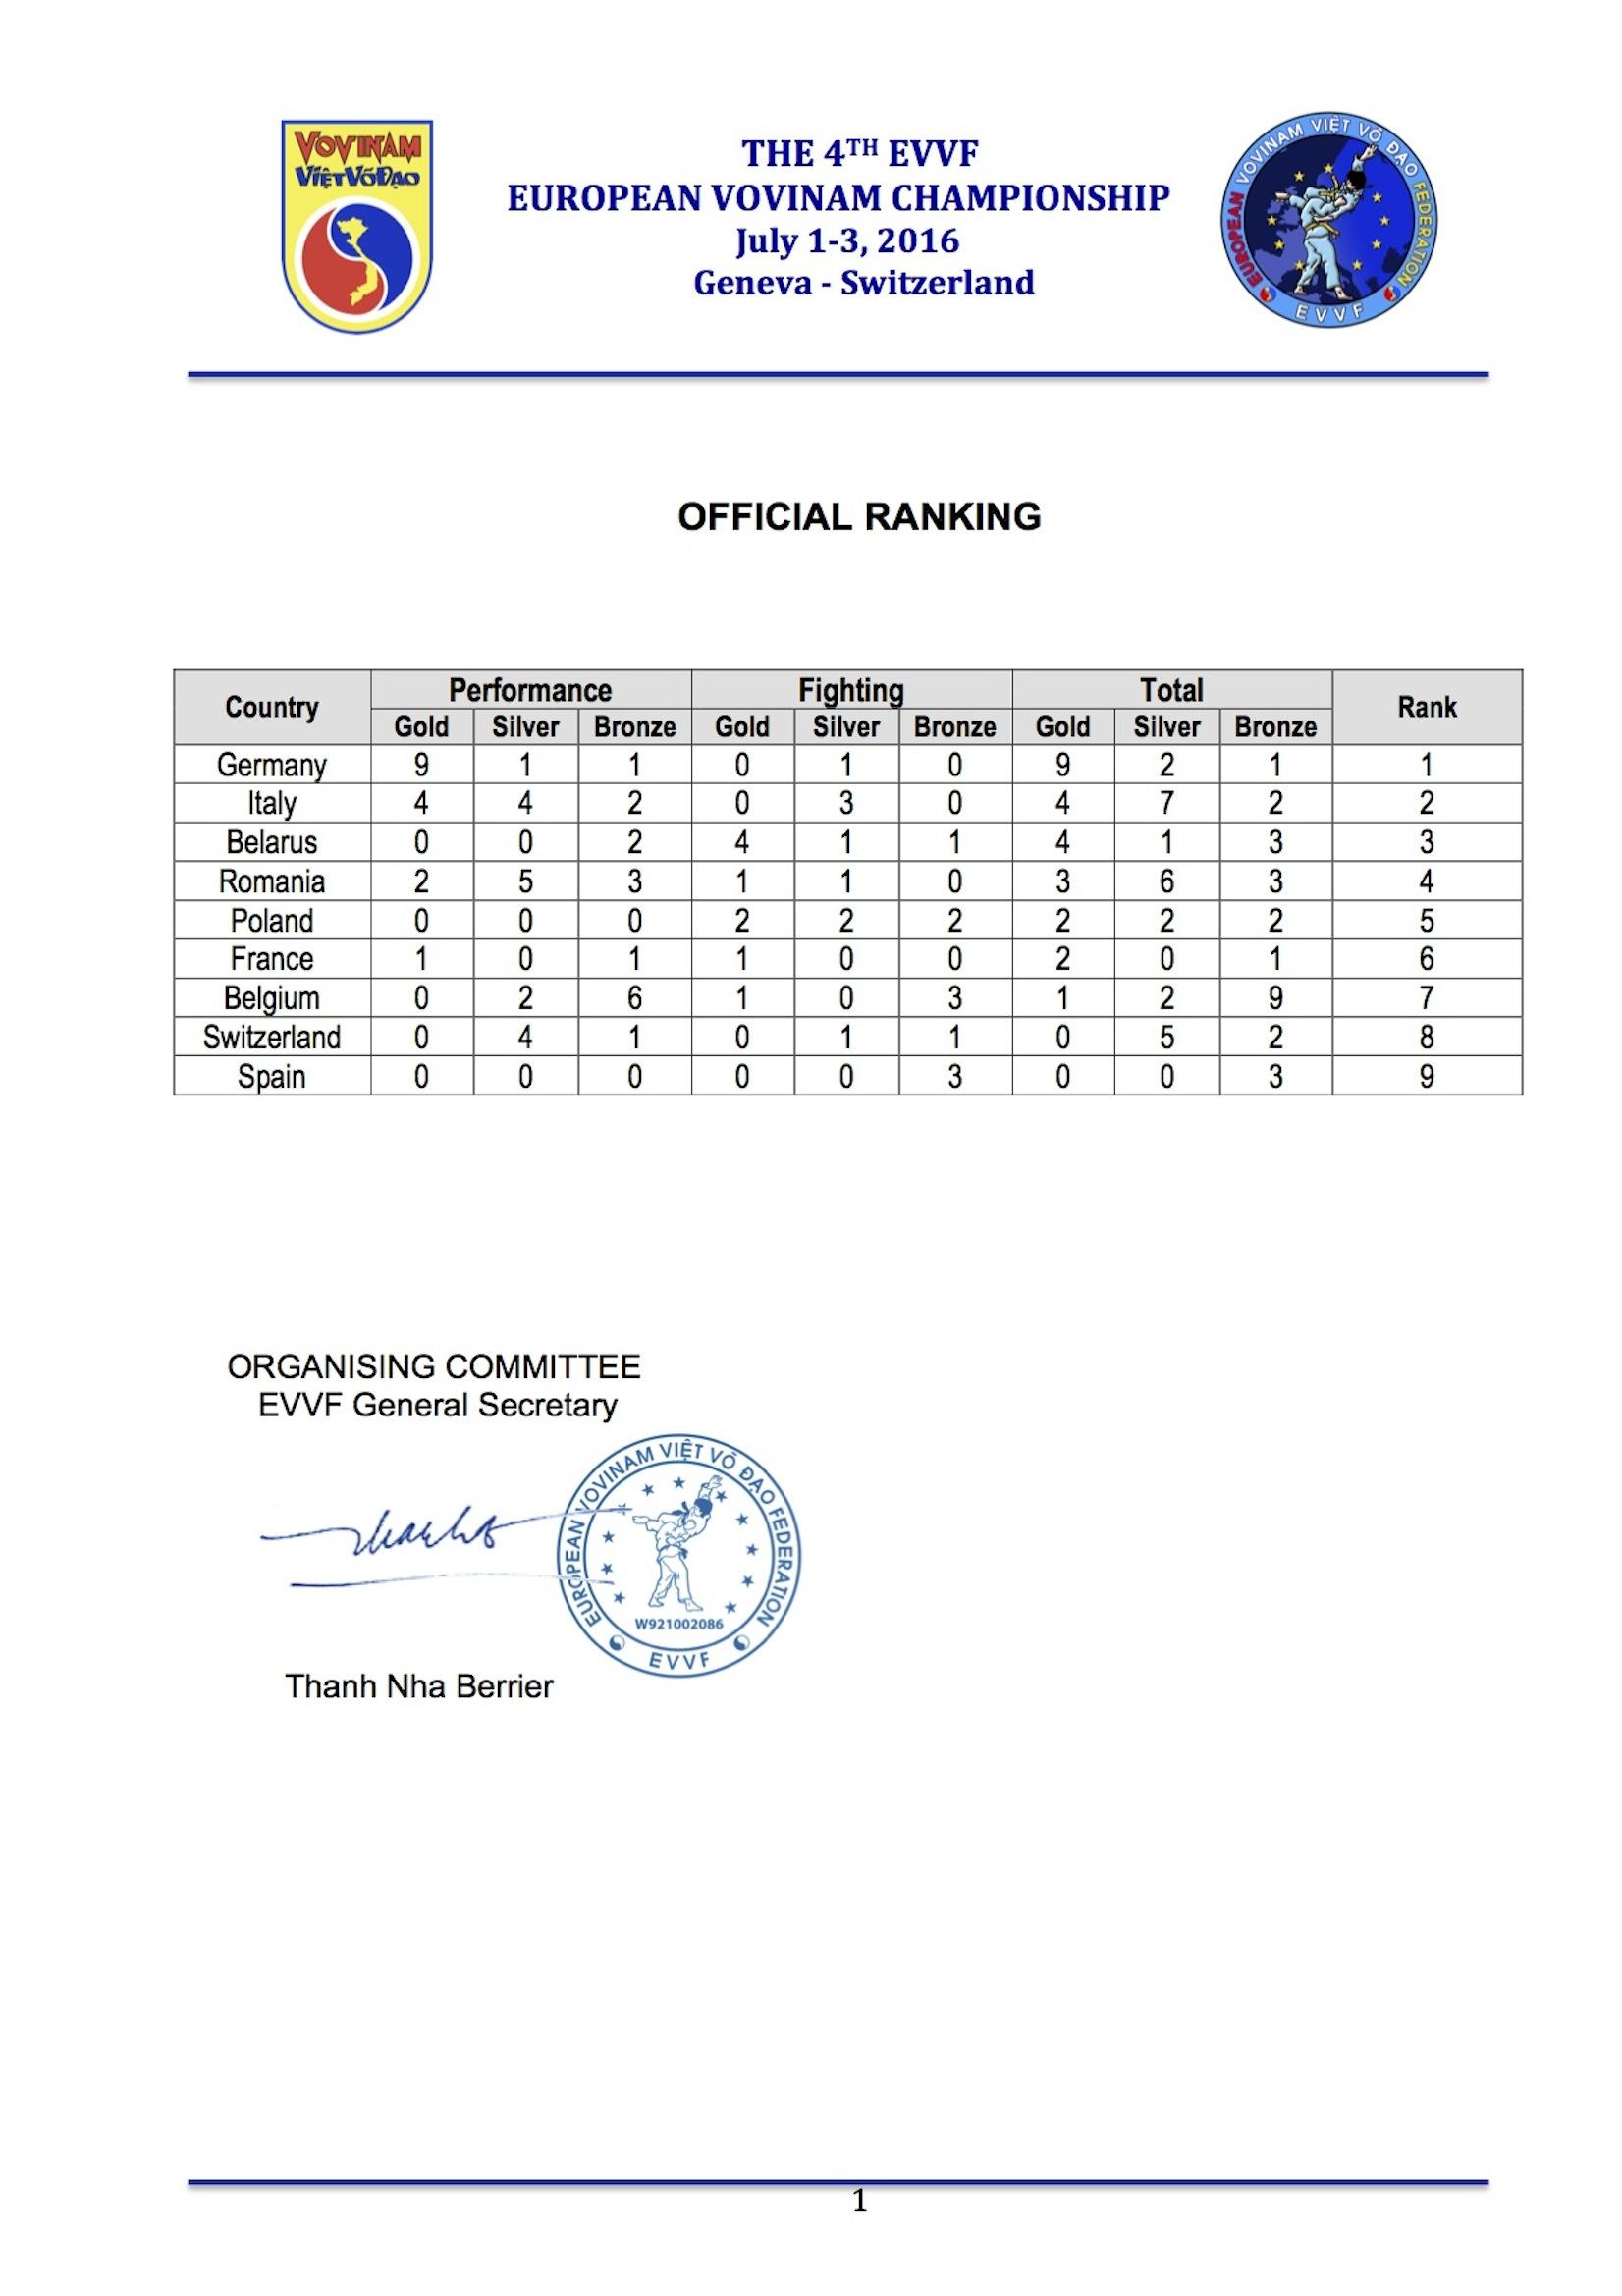 EVVF European Vovinam Championship 2016 - Result